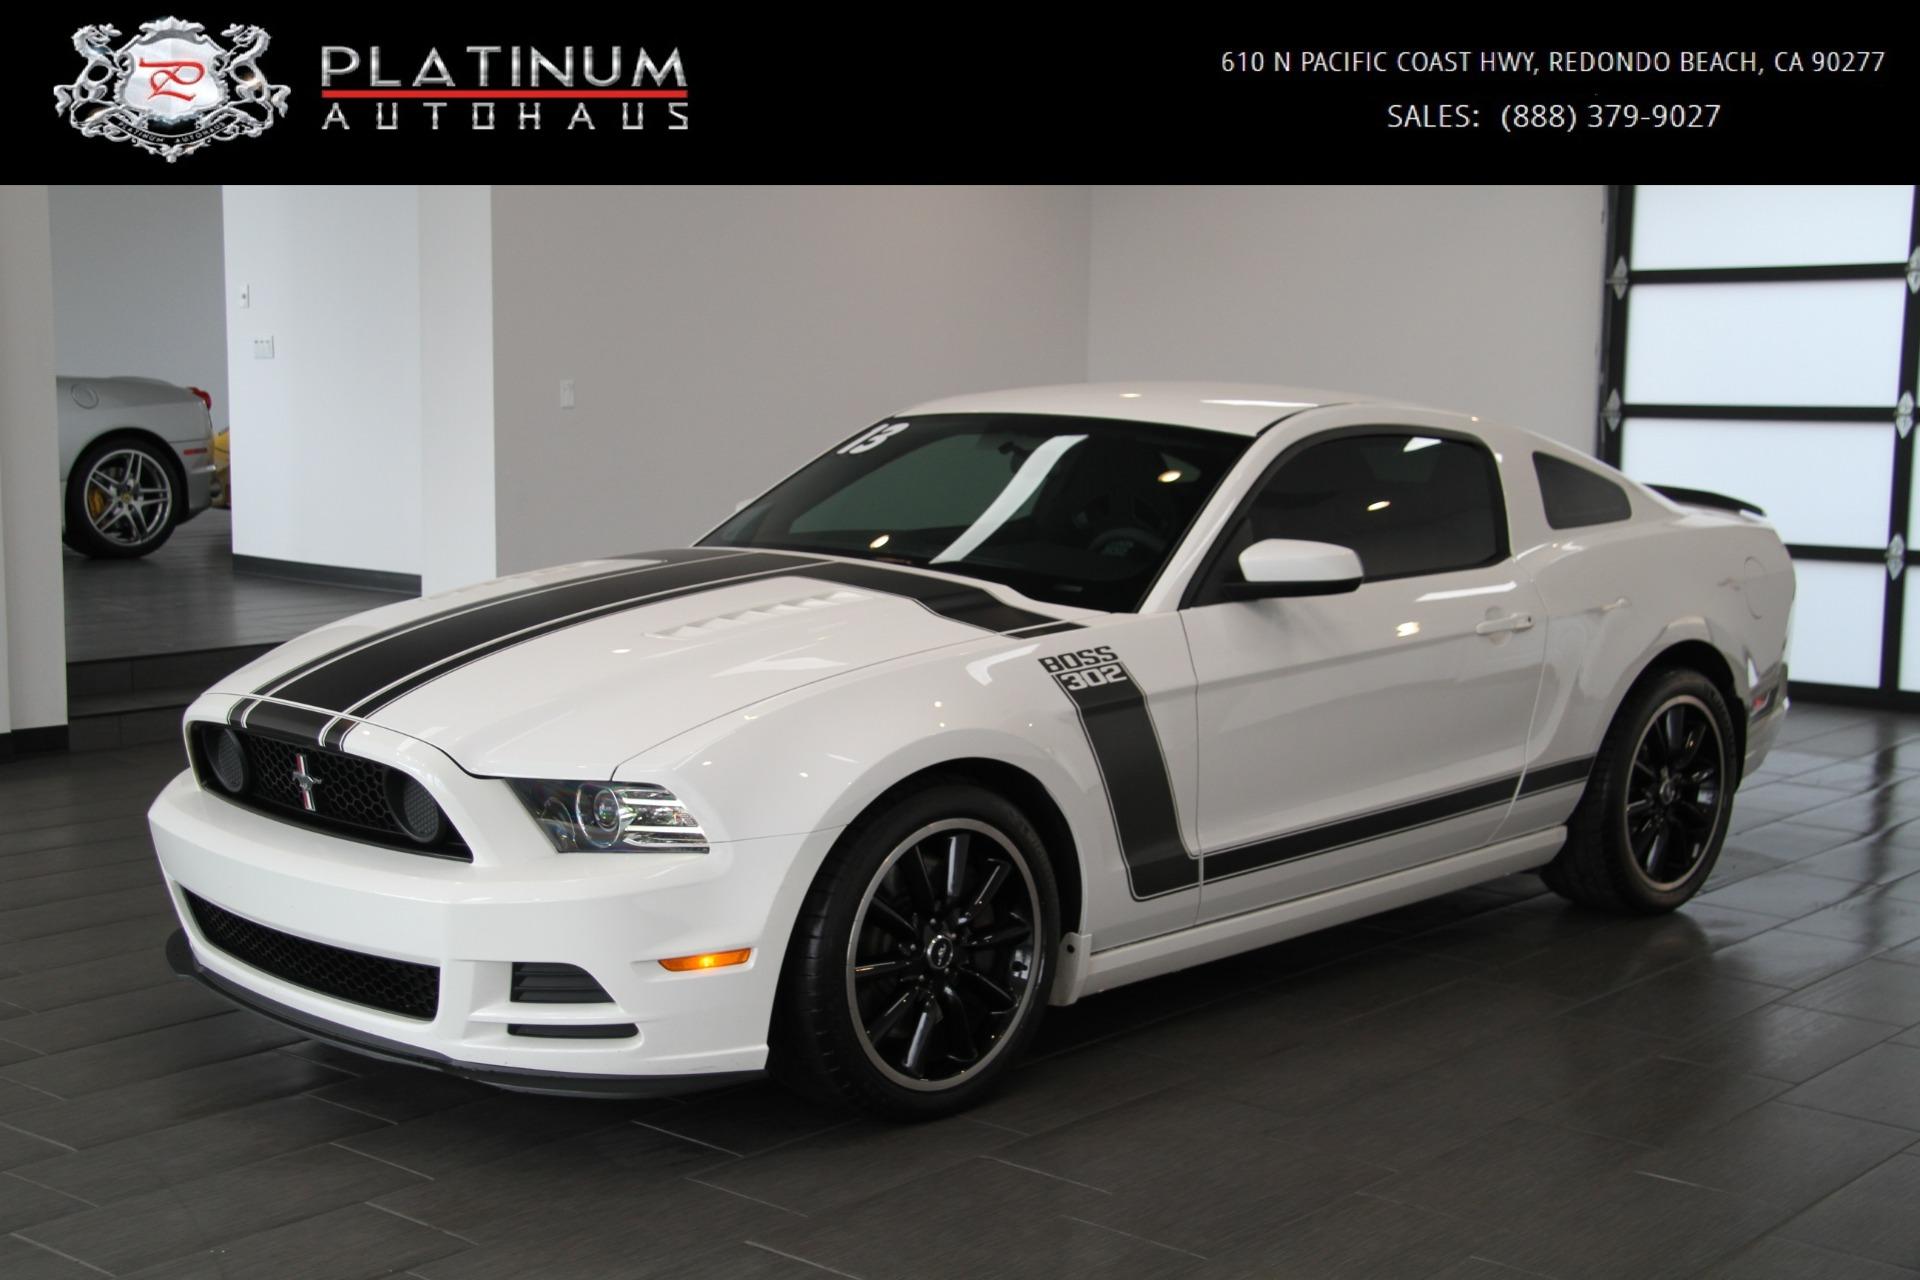 Custom Wheels Near Me >> 2013 Ford Mustang Boss 302 Stock # 267204 for sale near Redondo Beach, CA   CA Ford Dealer